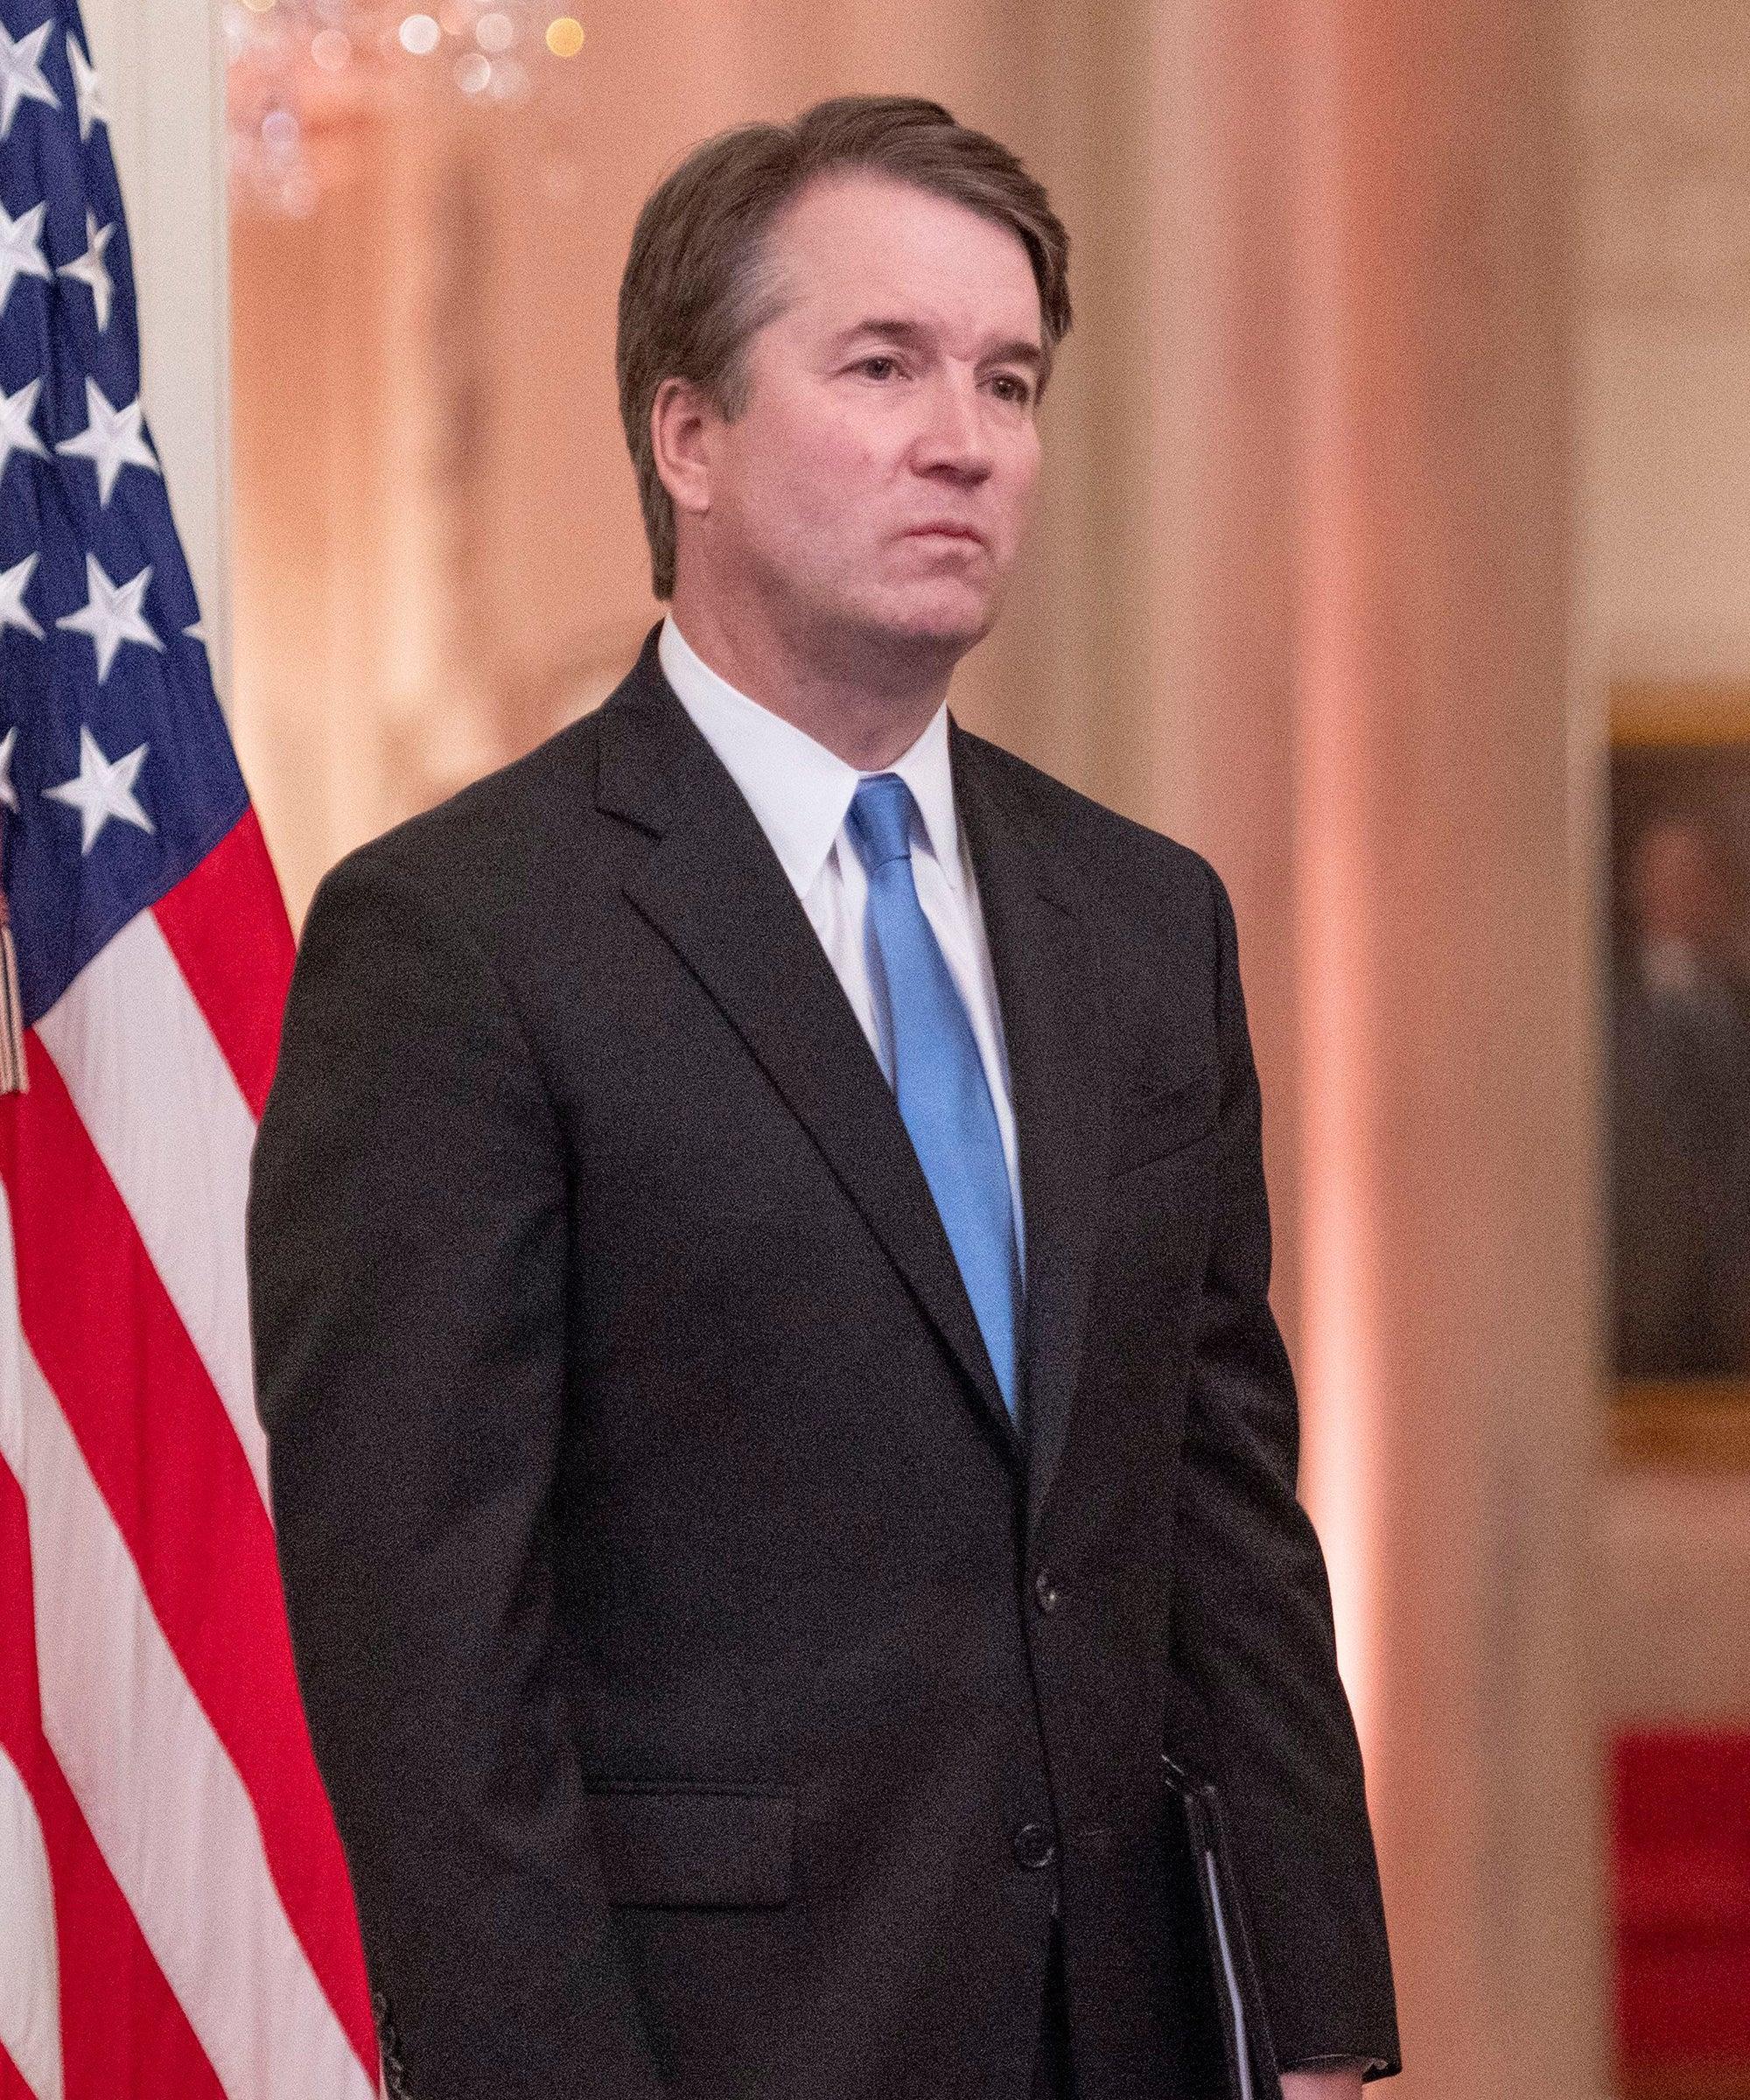 New Sexual Assault Allegations Reignite Calls For Brett Kavanaugh's Impeachment